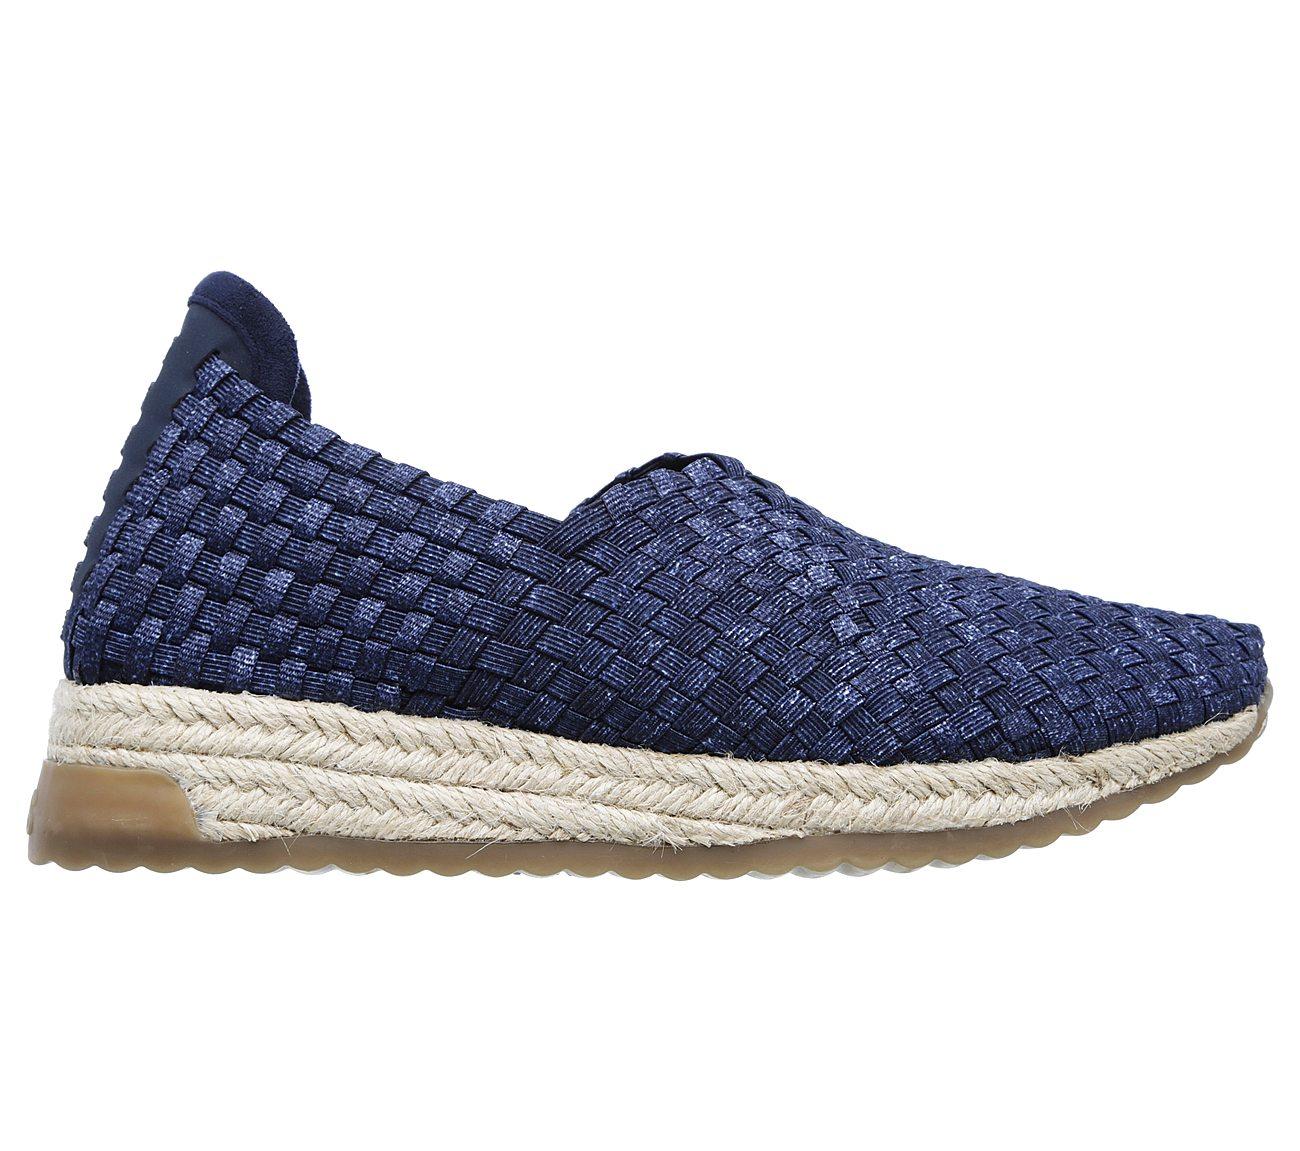 6d14b5feeb1 Buy SKECHERS BOBS High Jump - Urban Star BOBS Shoes only  37.00